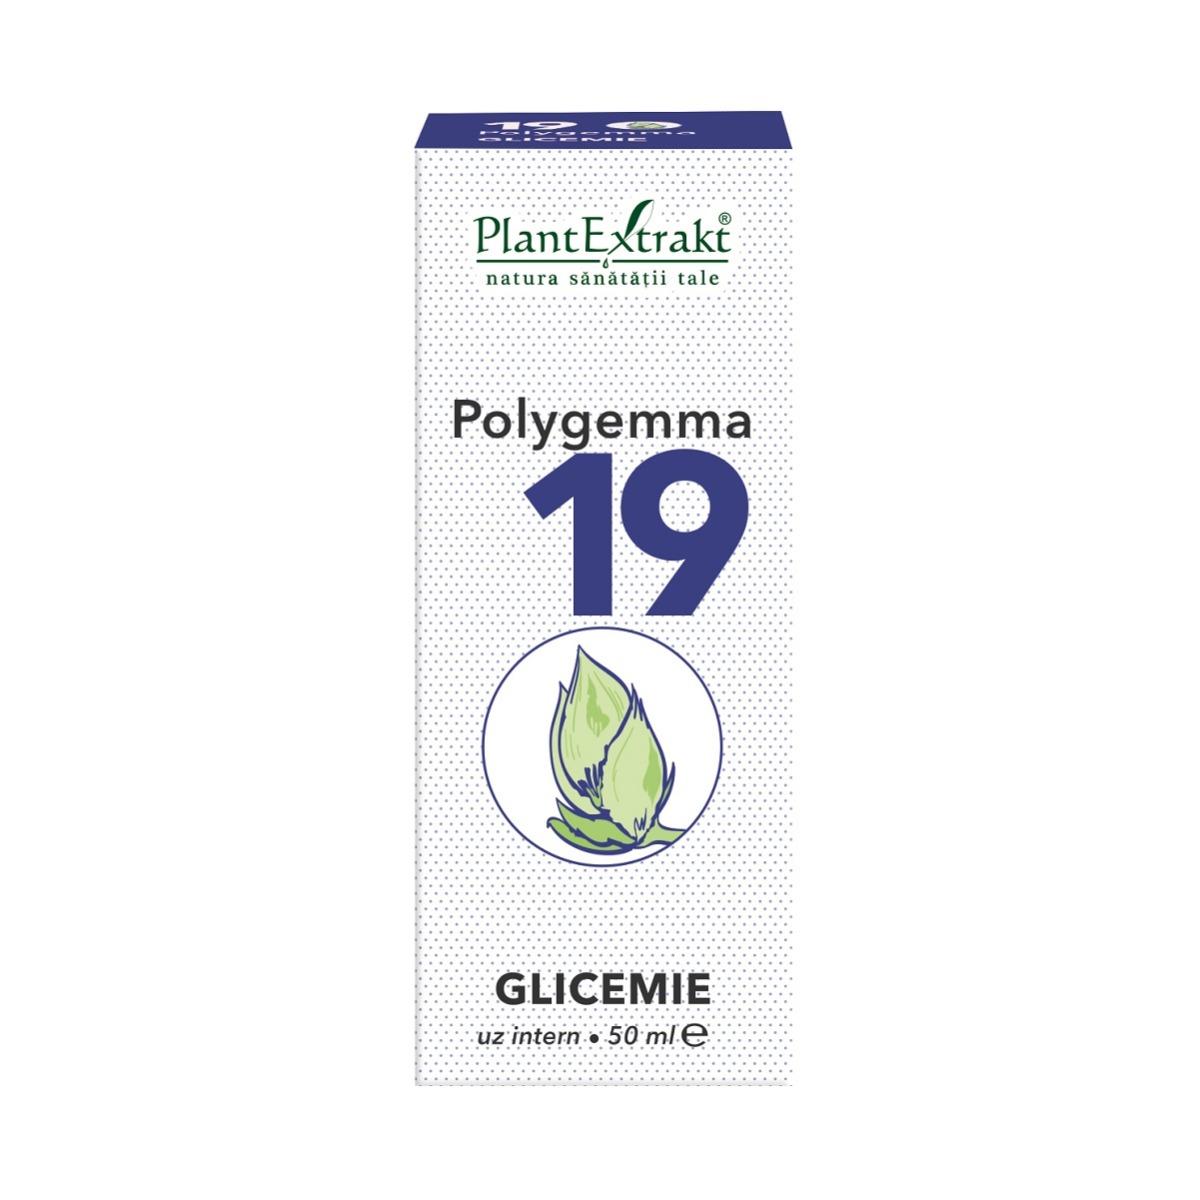 Polygemma 19, glicemie, 50ml, Plant Extrakt imagine produs 2021